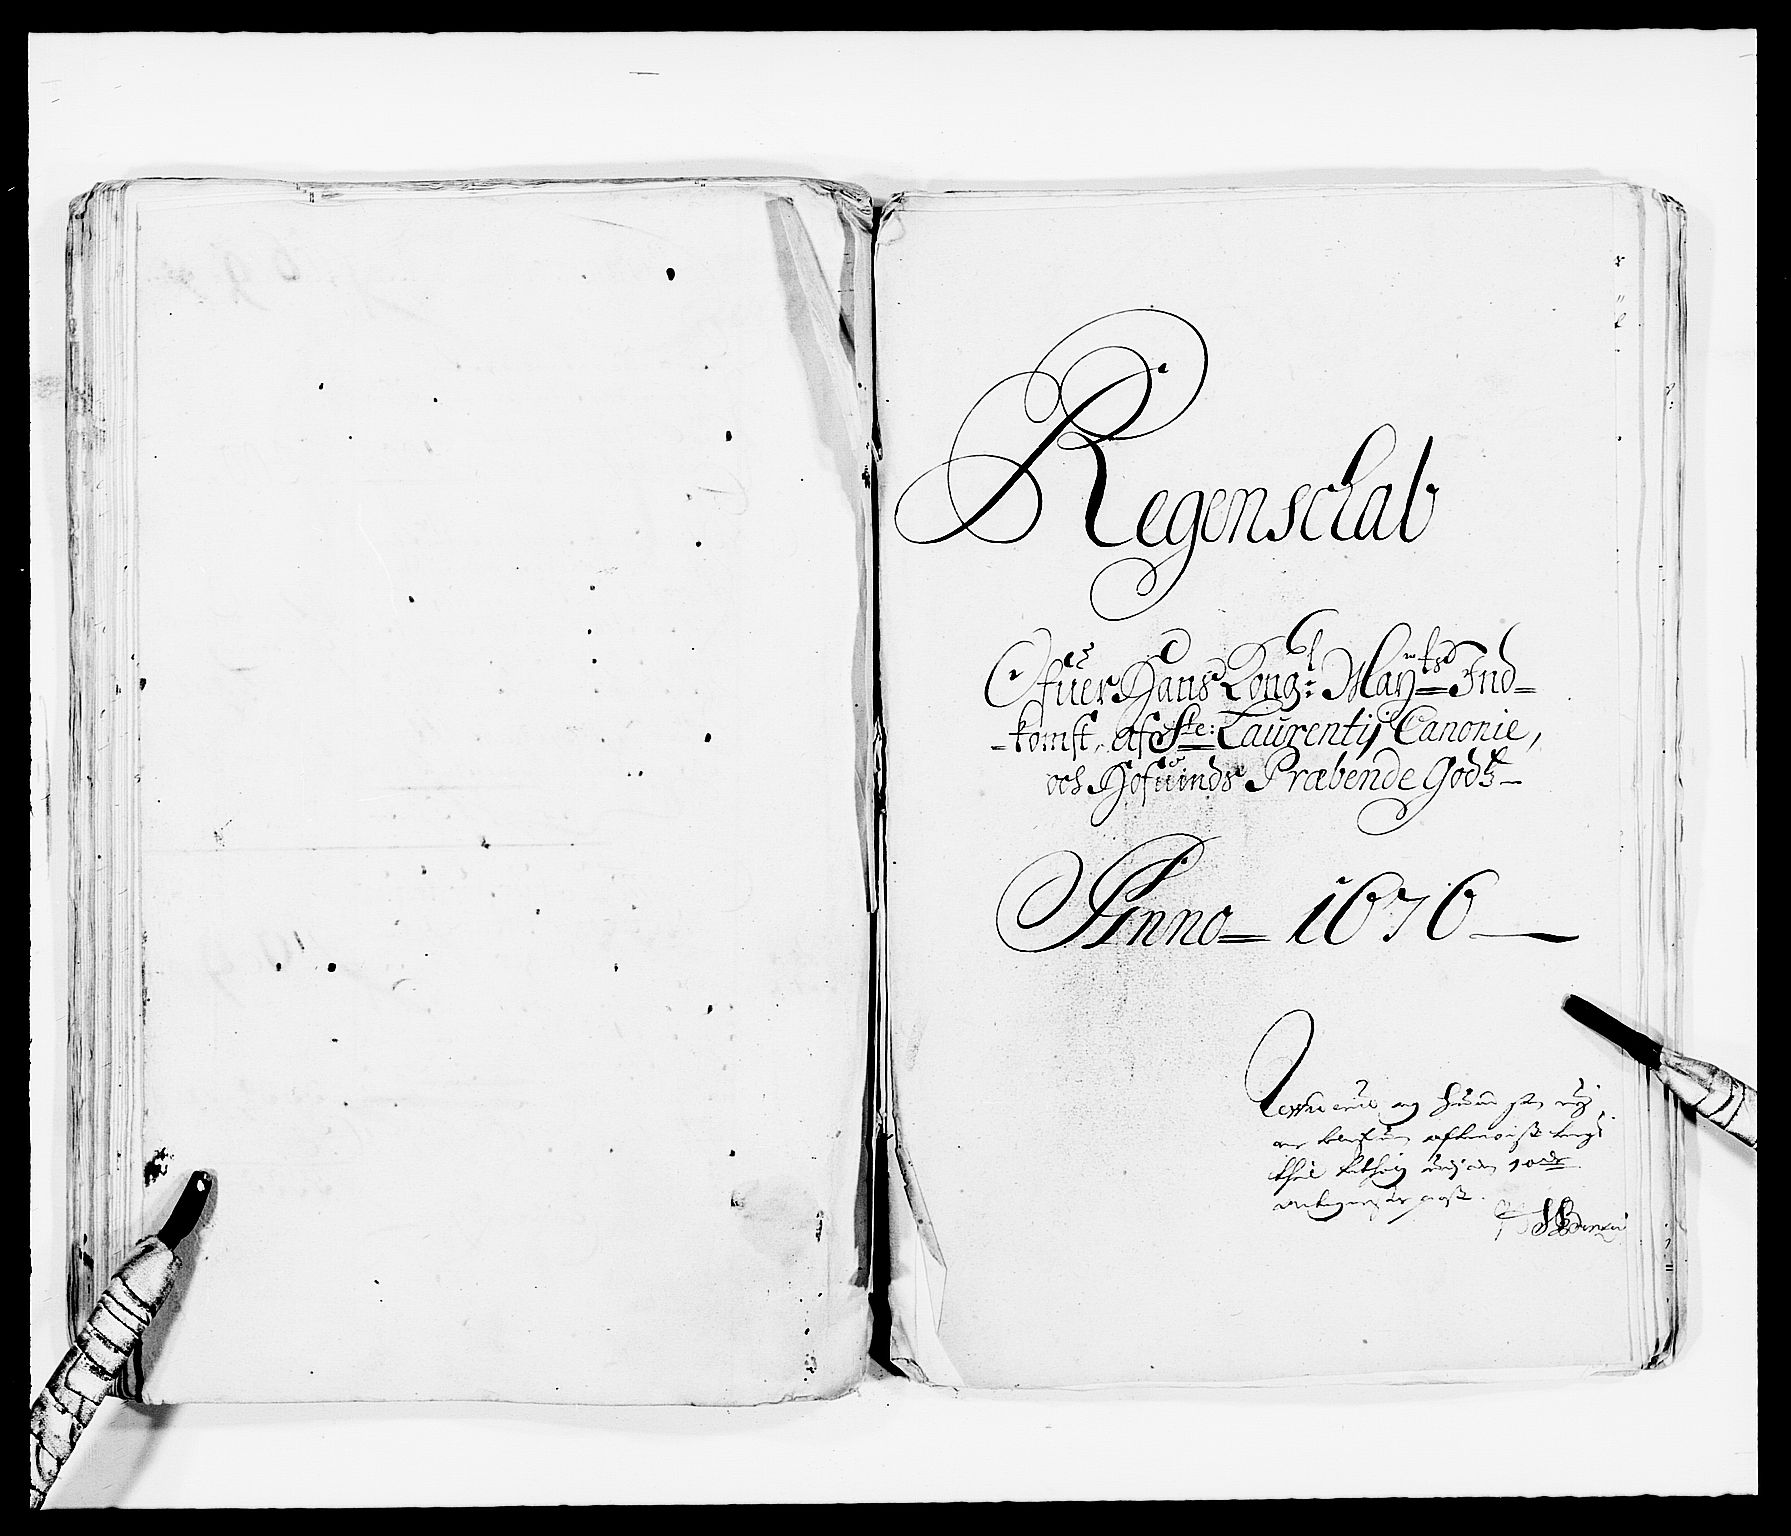 RA, Rentekammeret inntil 1814, Reviderte regnskaper, Fogderegnskap, R32/L1845: Fogderegnskap Jarlsberg grevskap, 1676-1678, s. 53